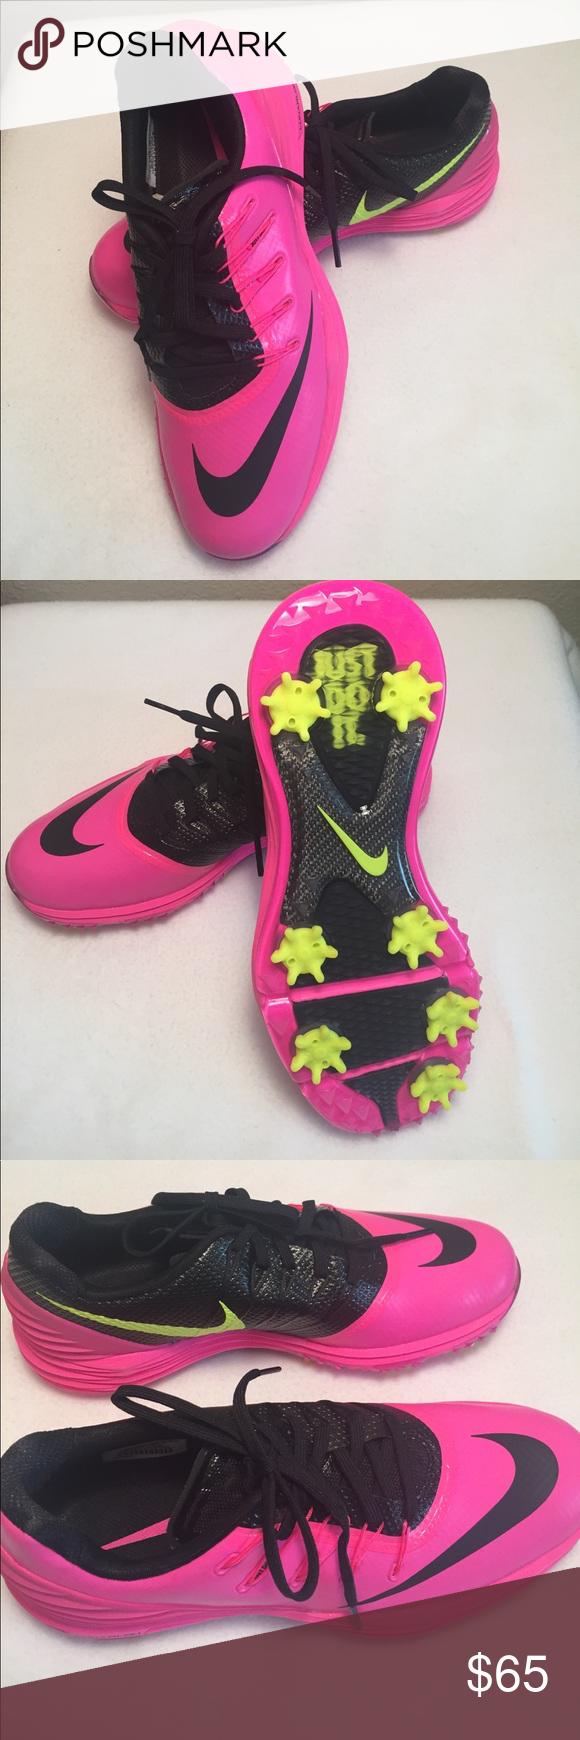 284296432831b Nike women s lunarlon golf shoes NEW